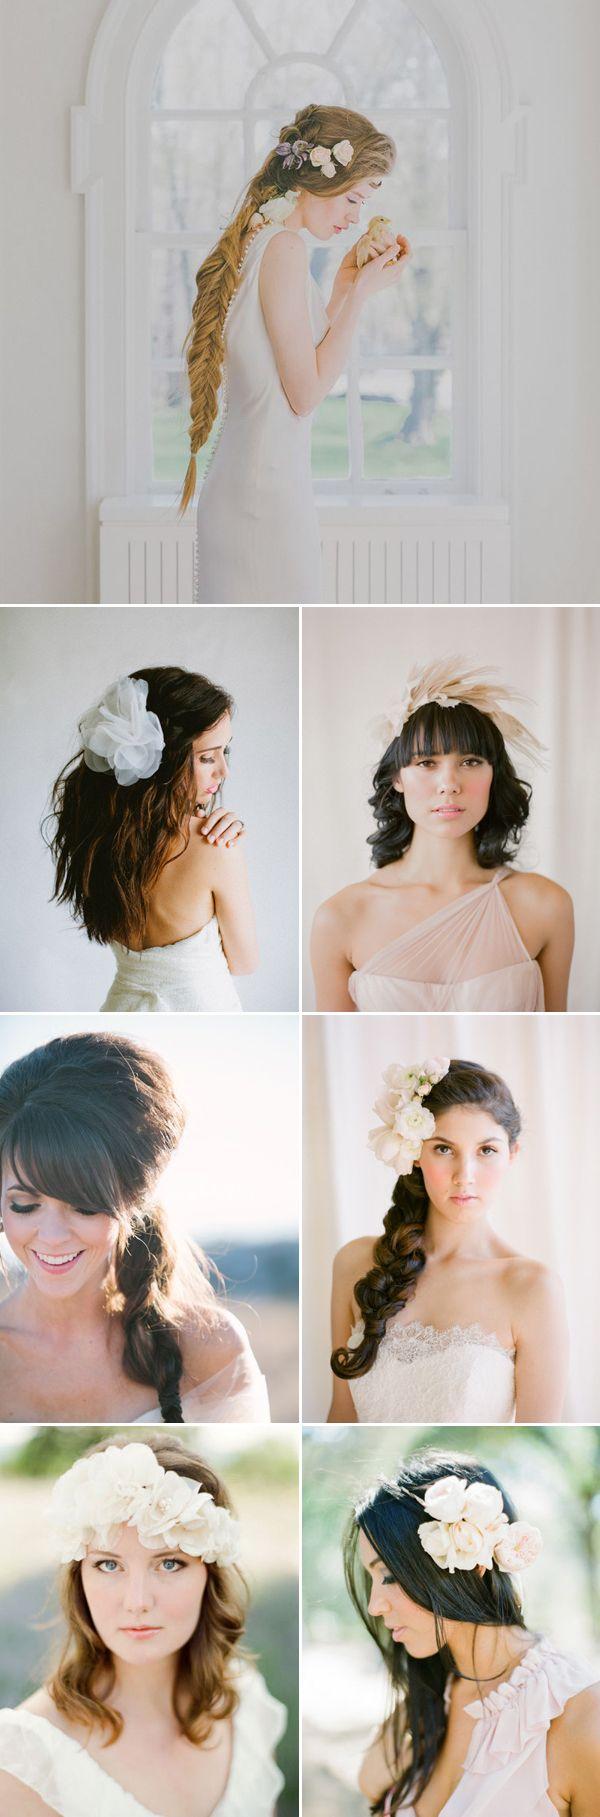 27 Beautiful Summer Bridal Hairstyles | Bridal hairstyle, Romantic ...